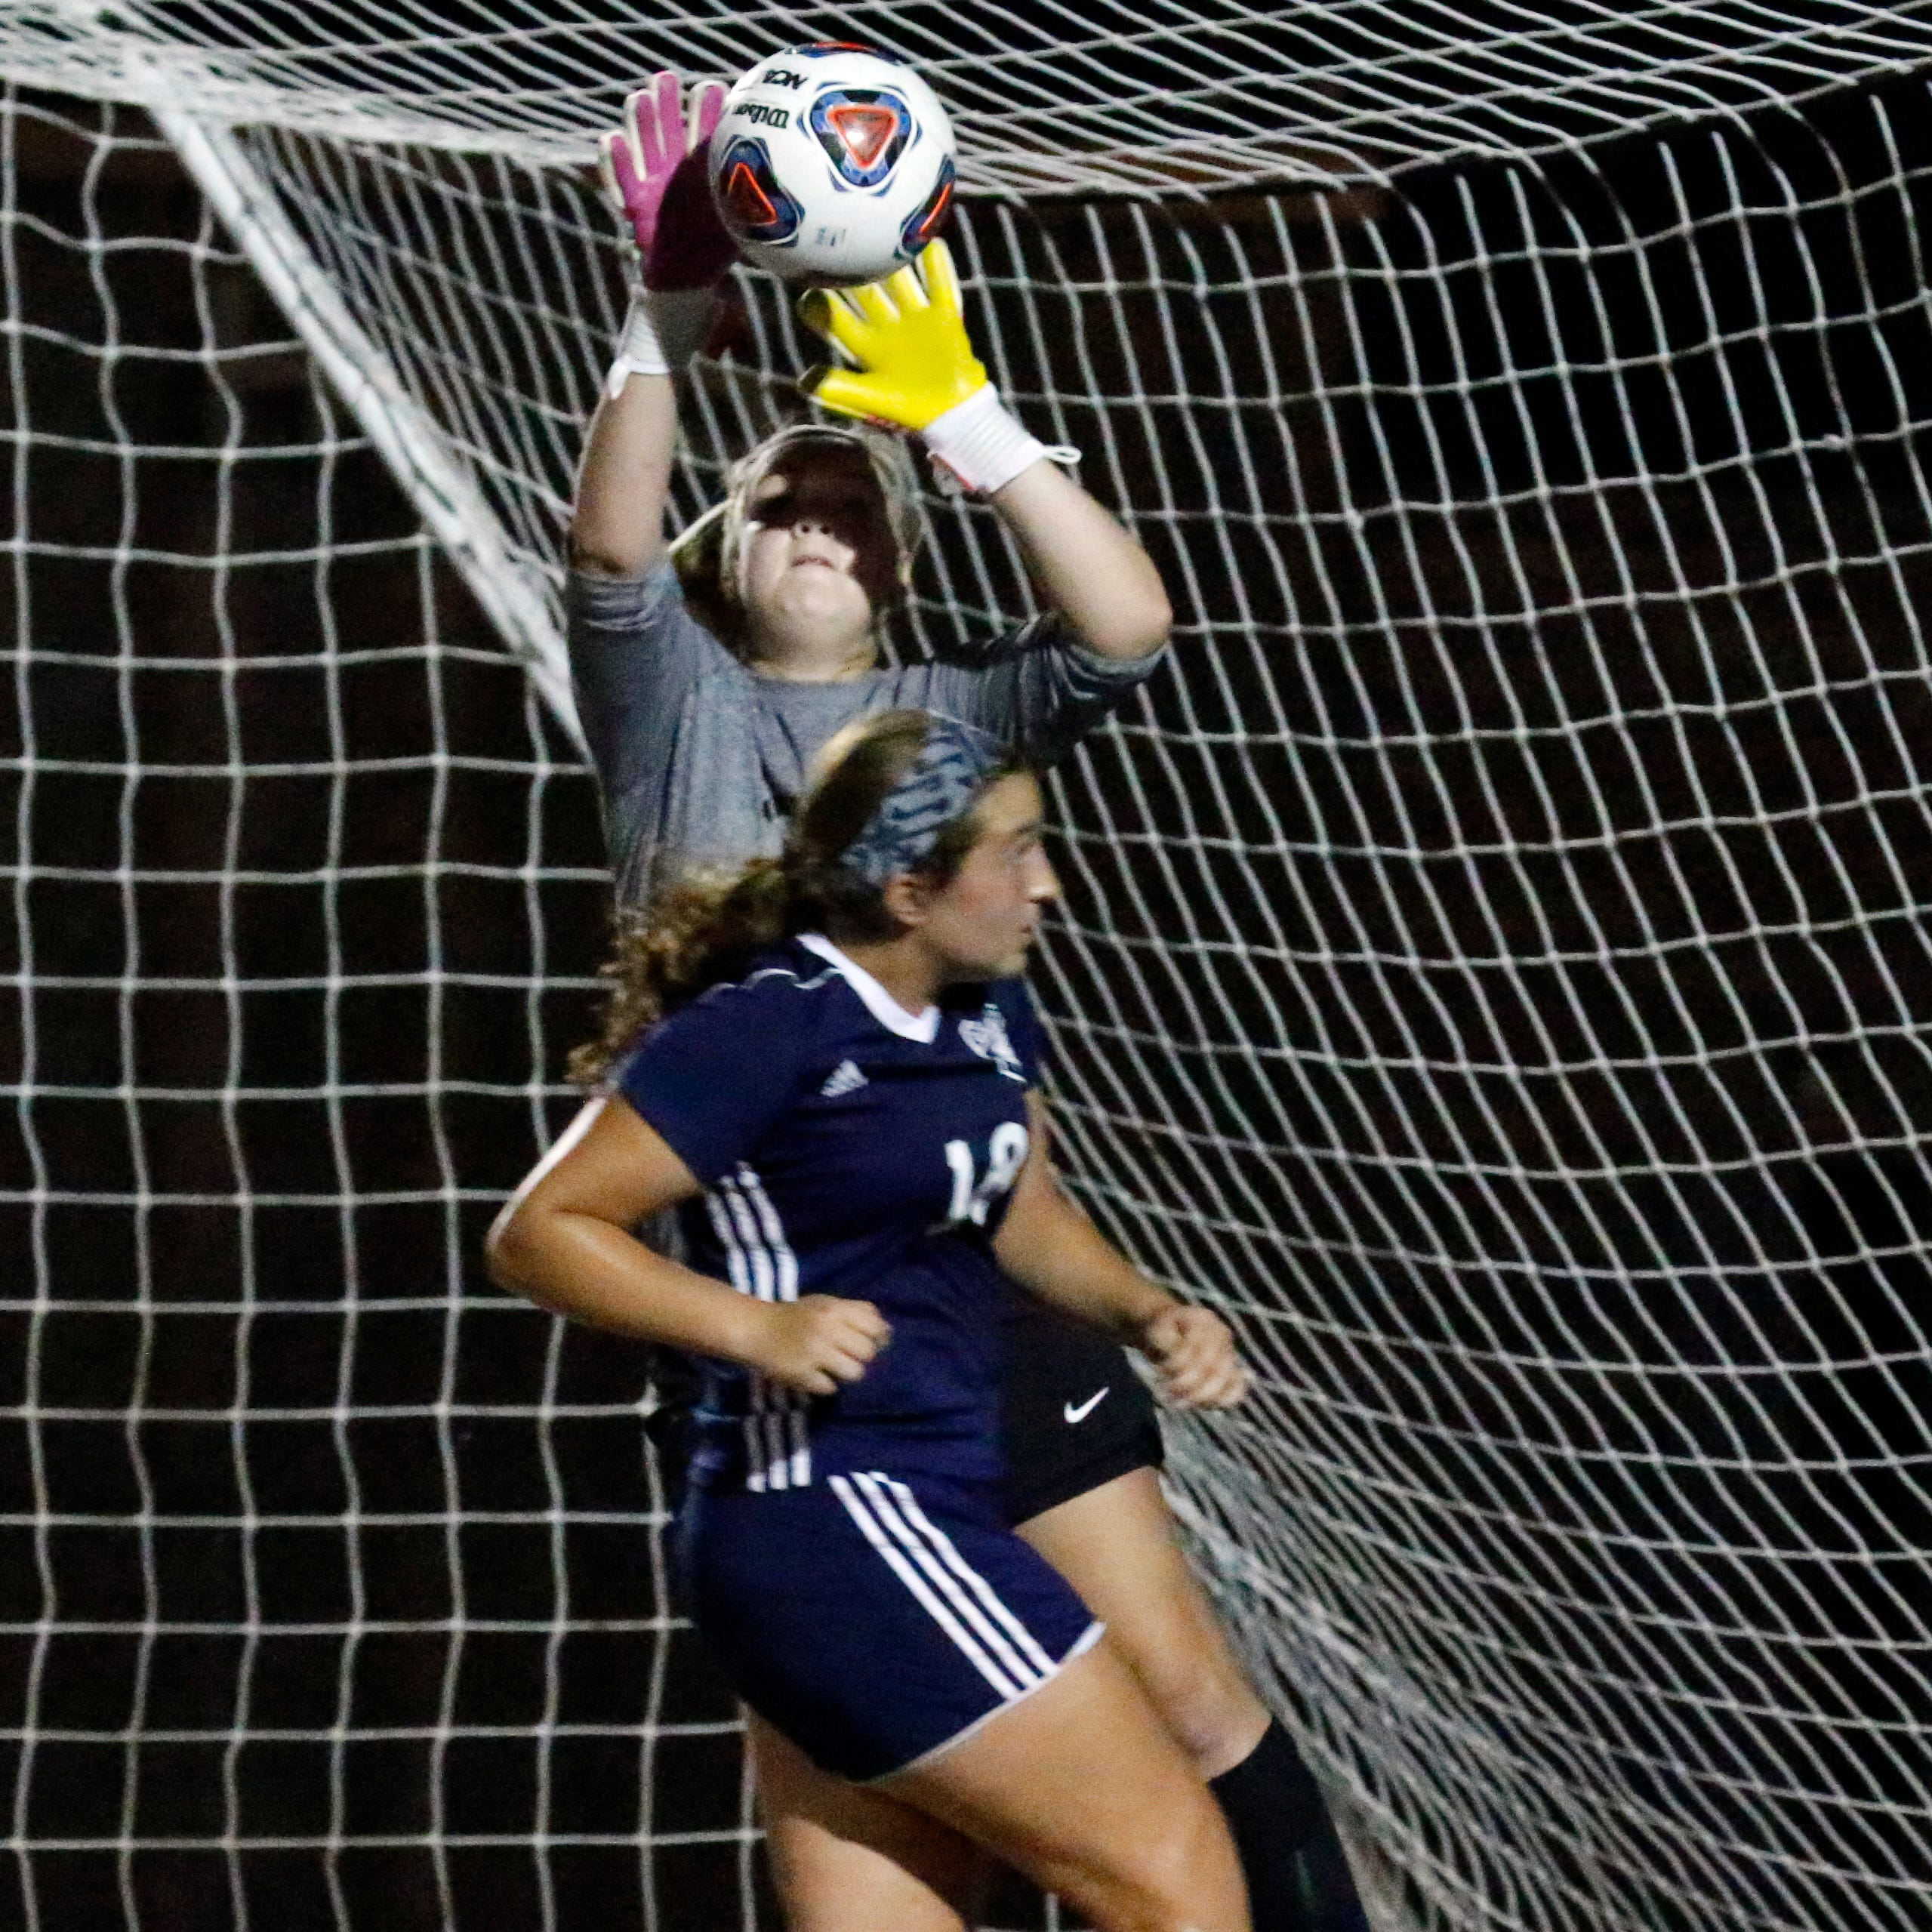 Lancaster girls soccer defeated Fairfield Union in season opener